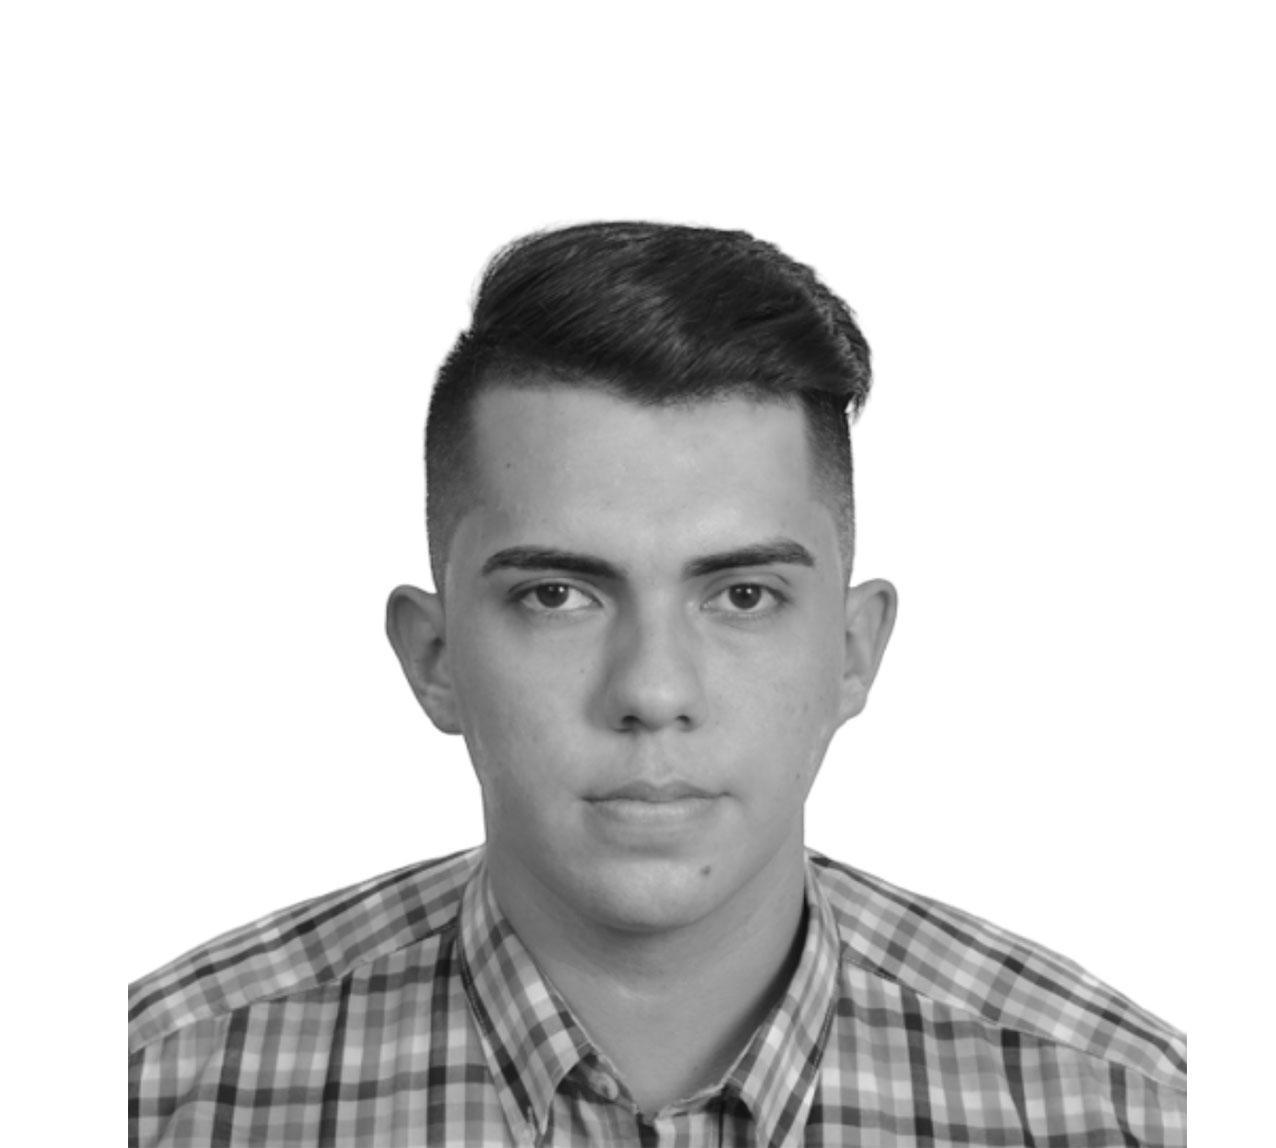 https://suricatalabs.com/wp-content/uploads/2020/04/felipe.jpg